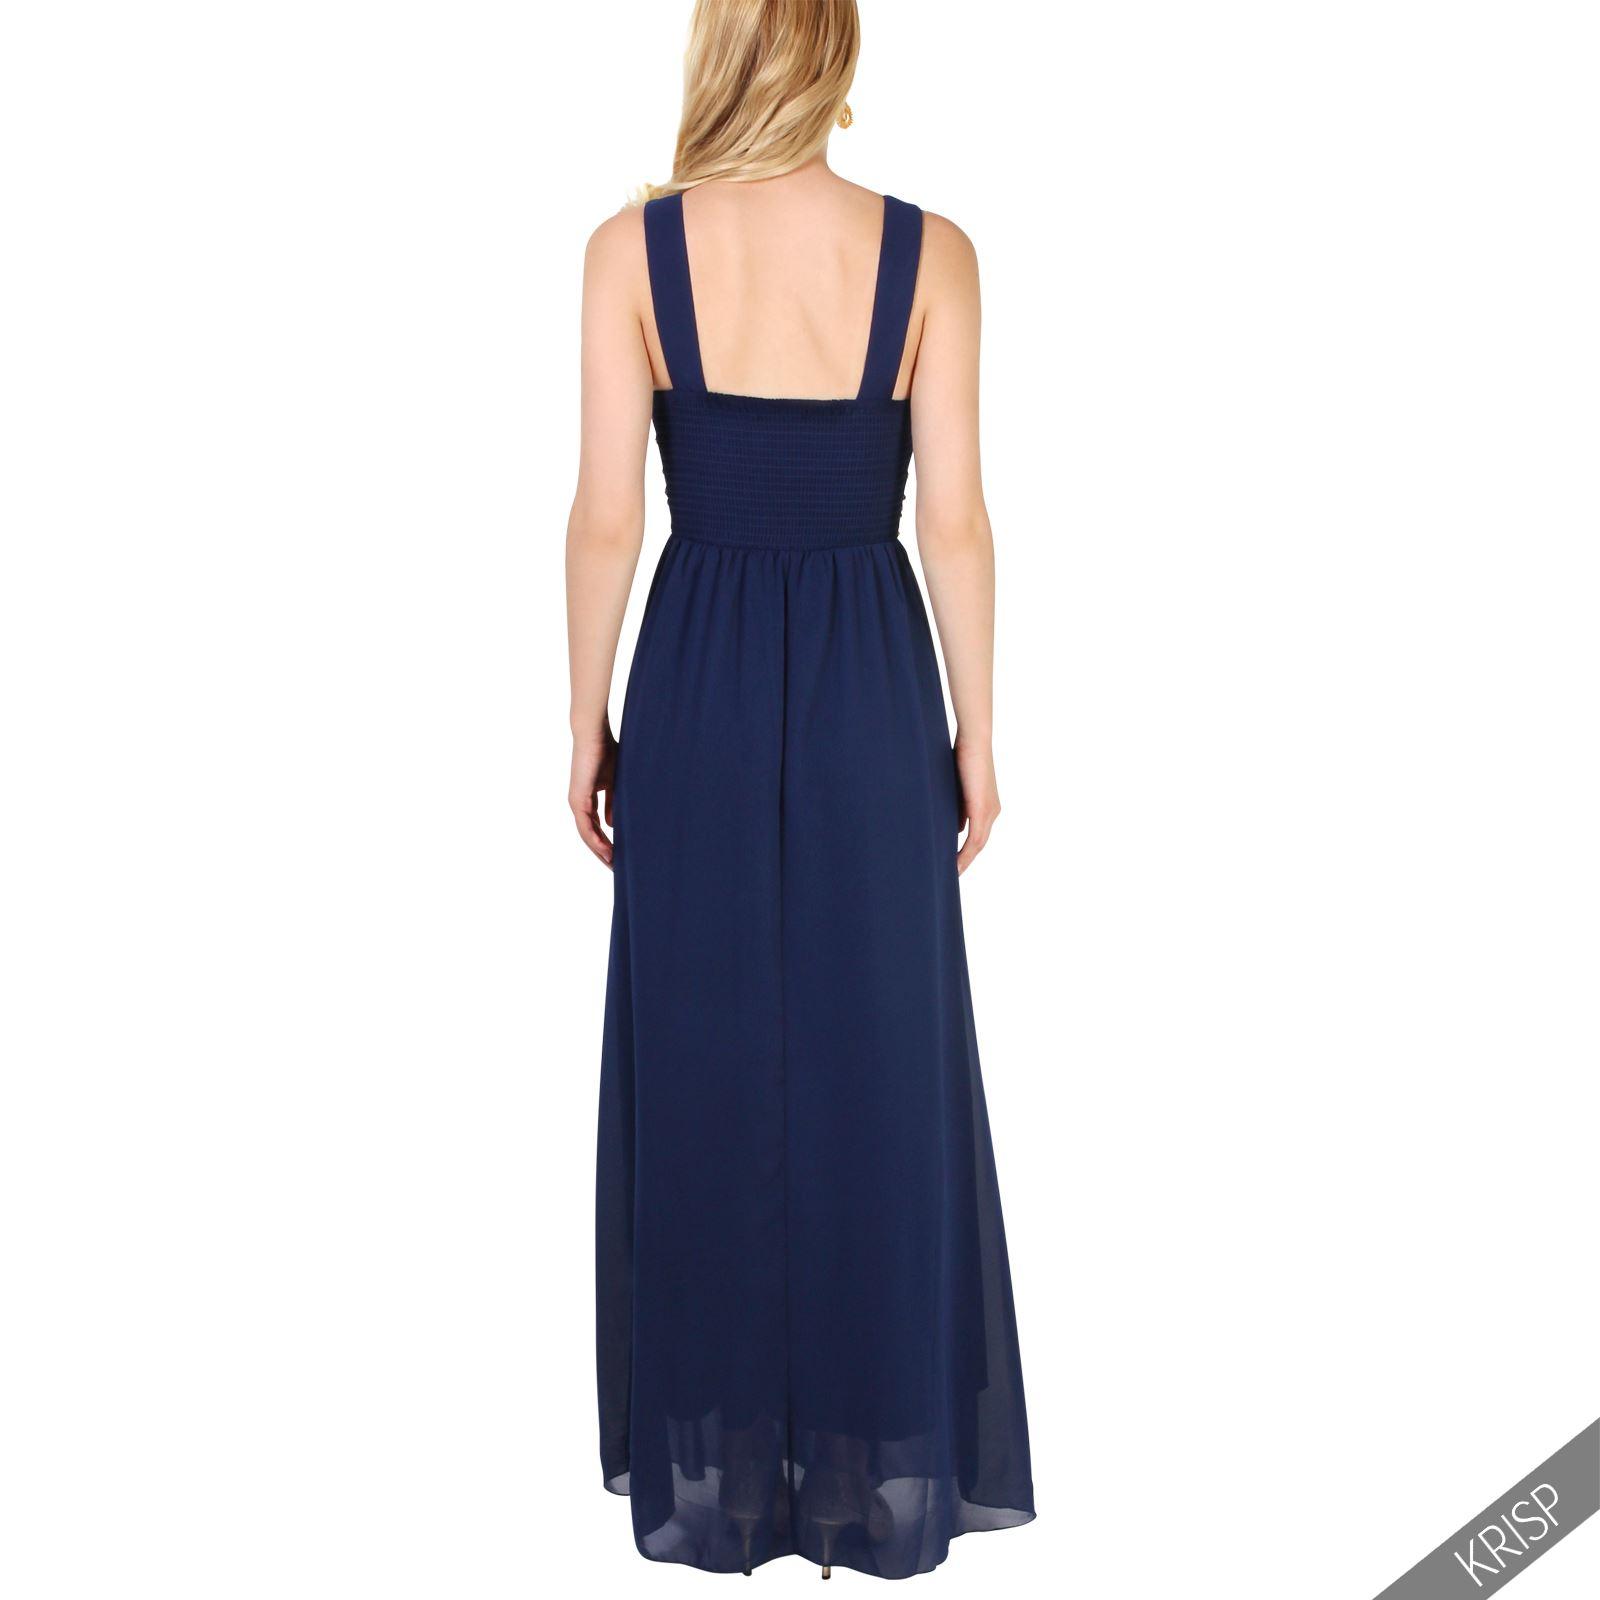 Size 8 black dress 18 20